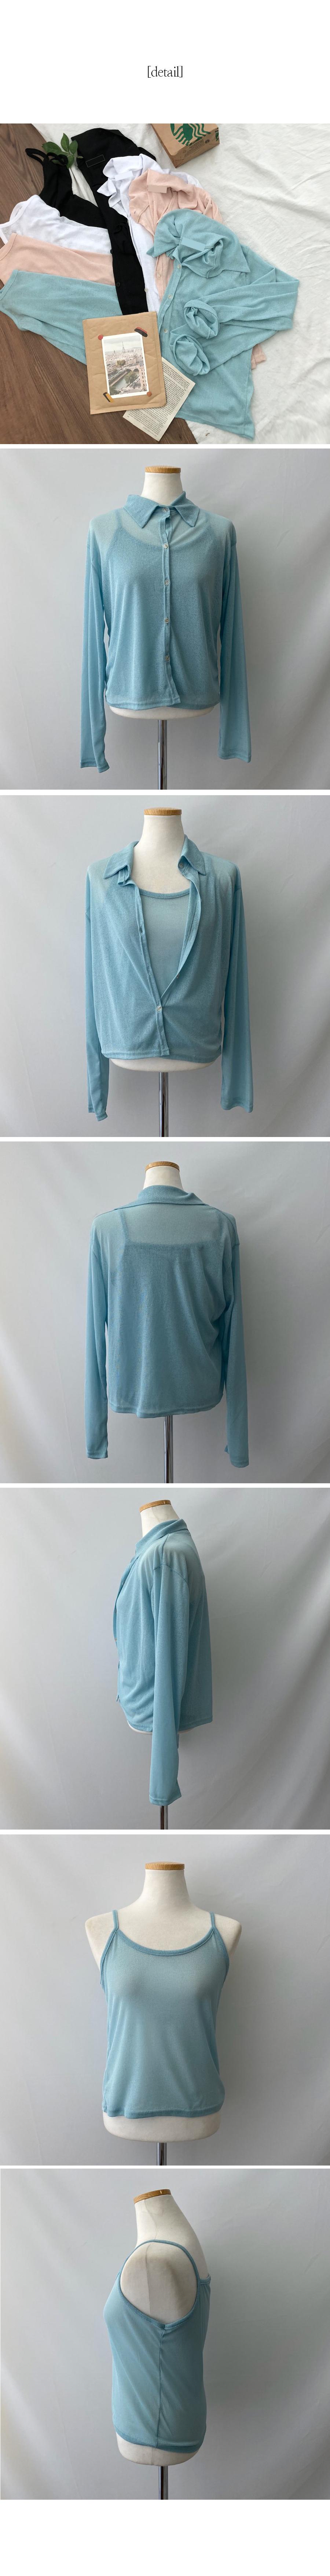 Beachside Sleeveless + Shirt Two Piece Set